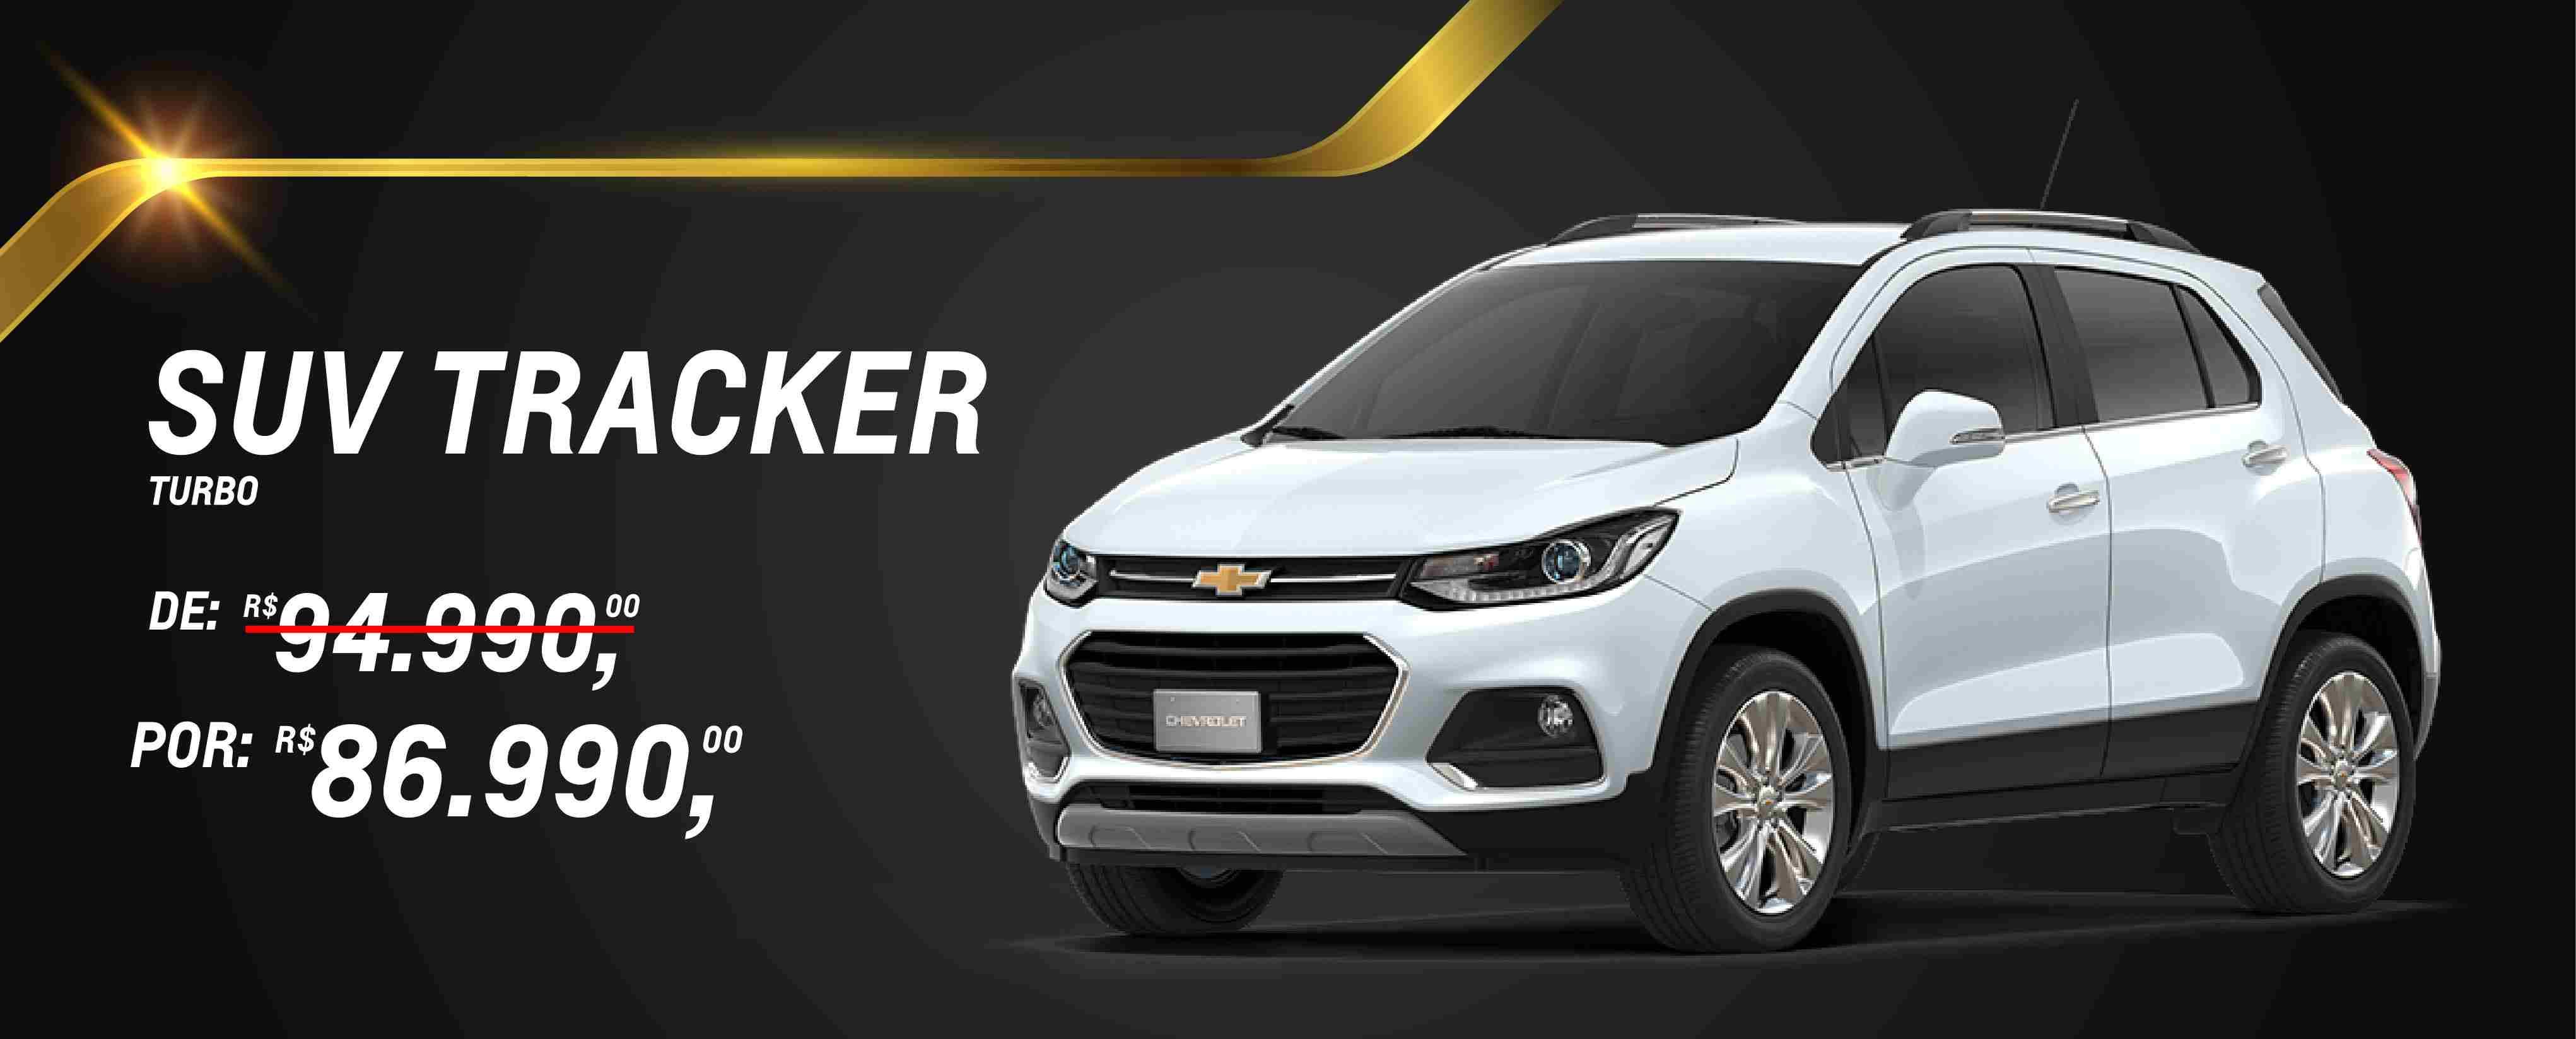 SUV-Tracker-Turbo